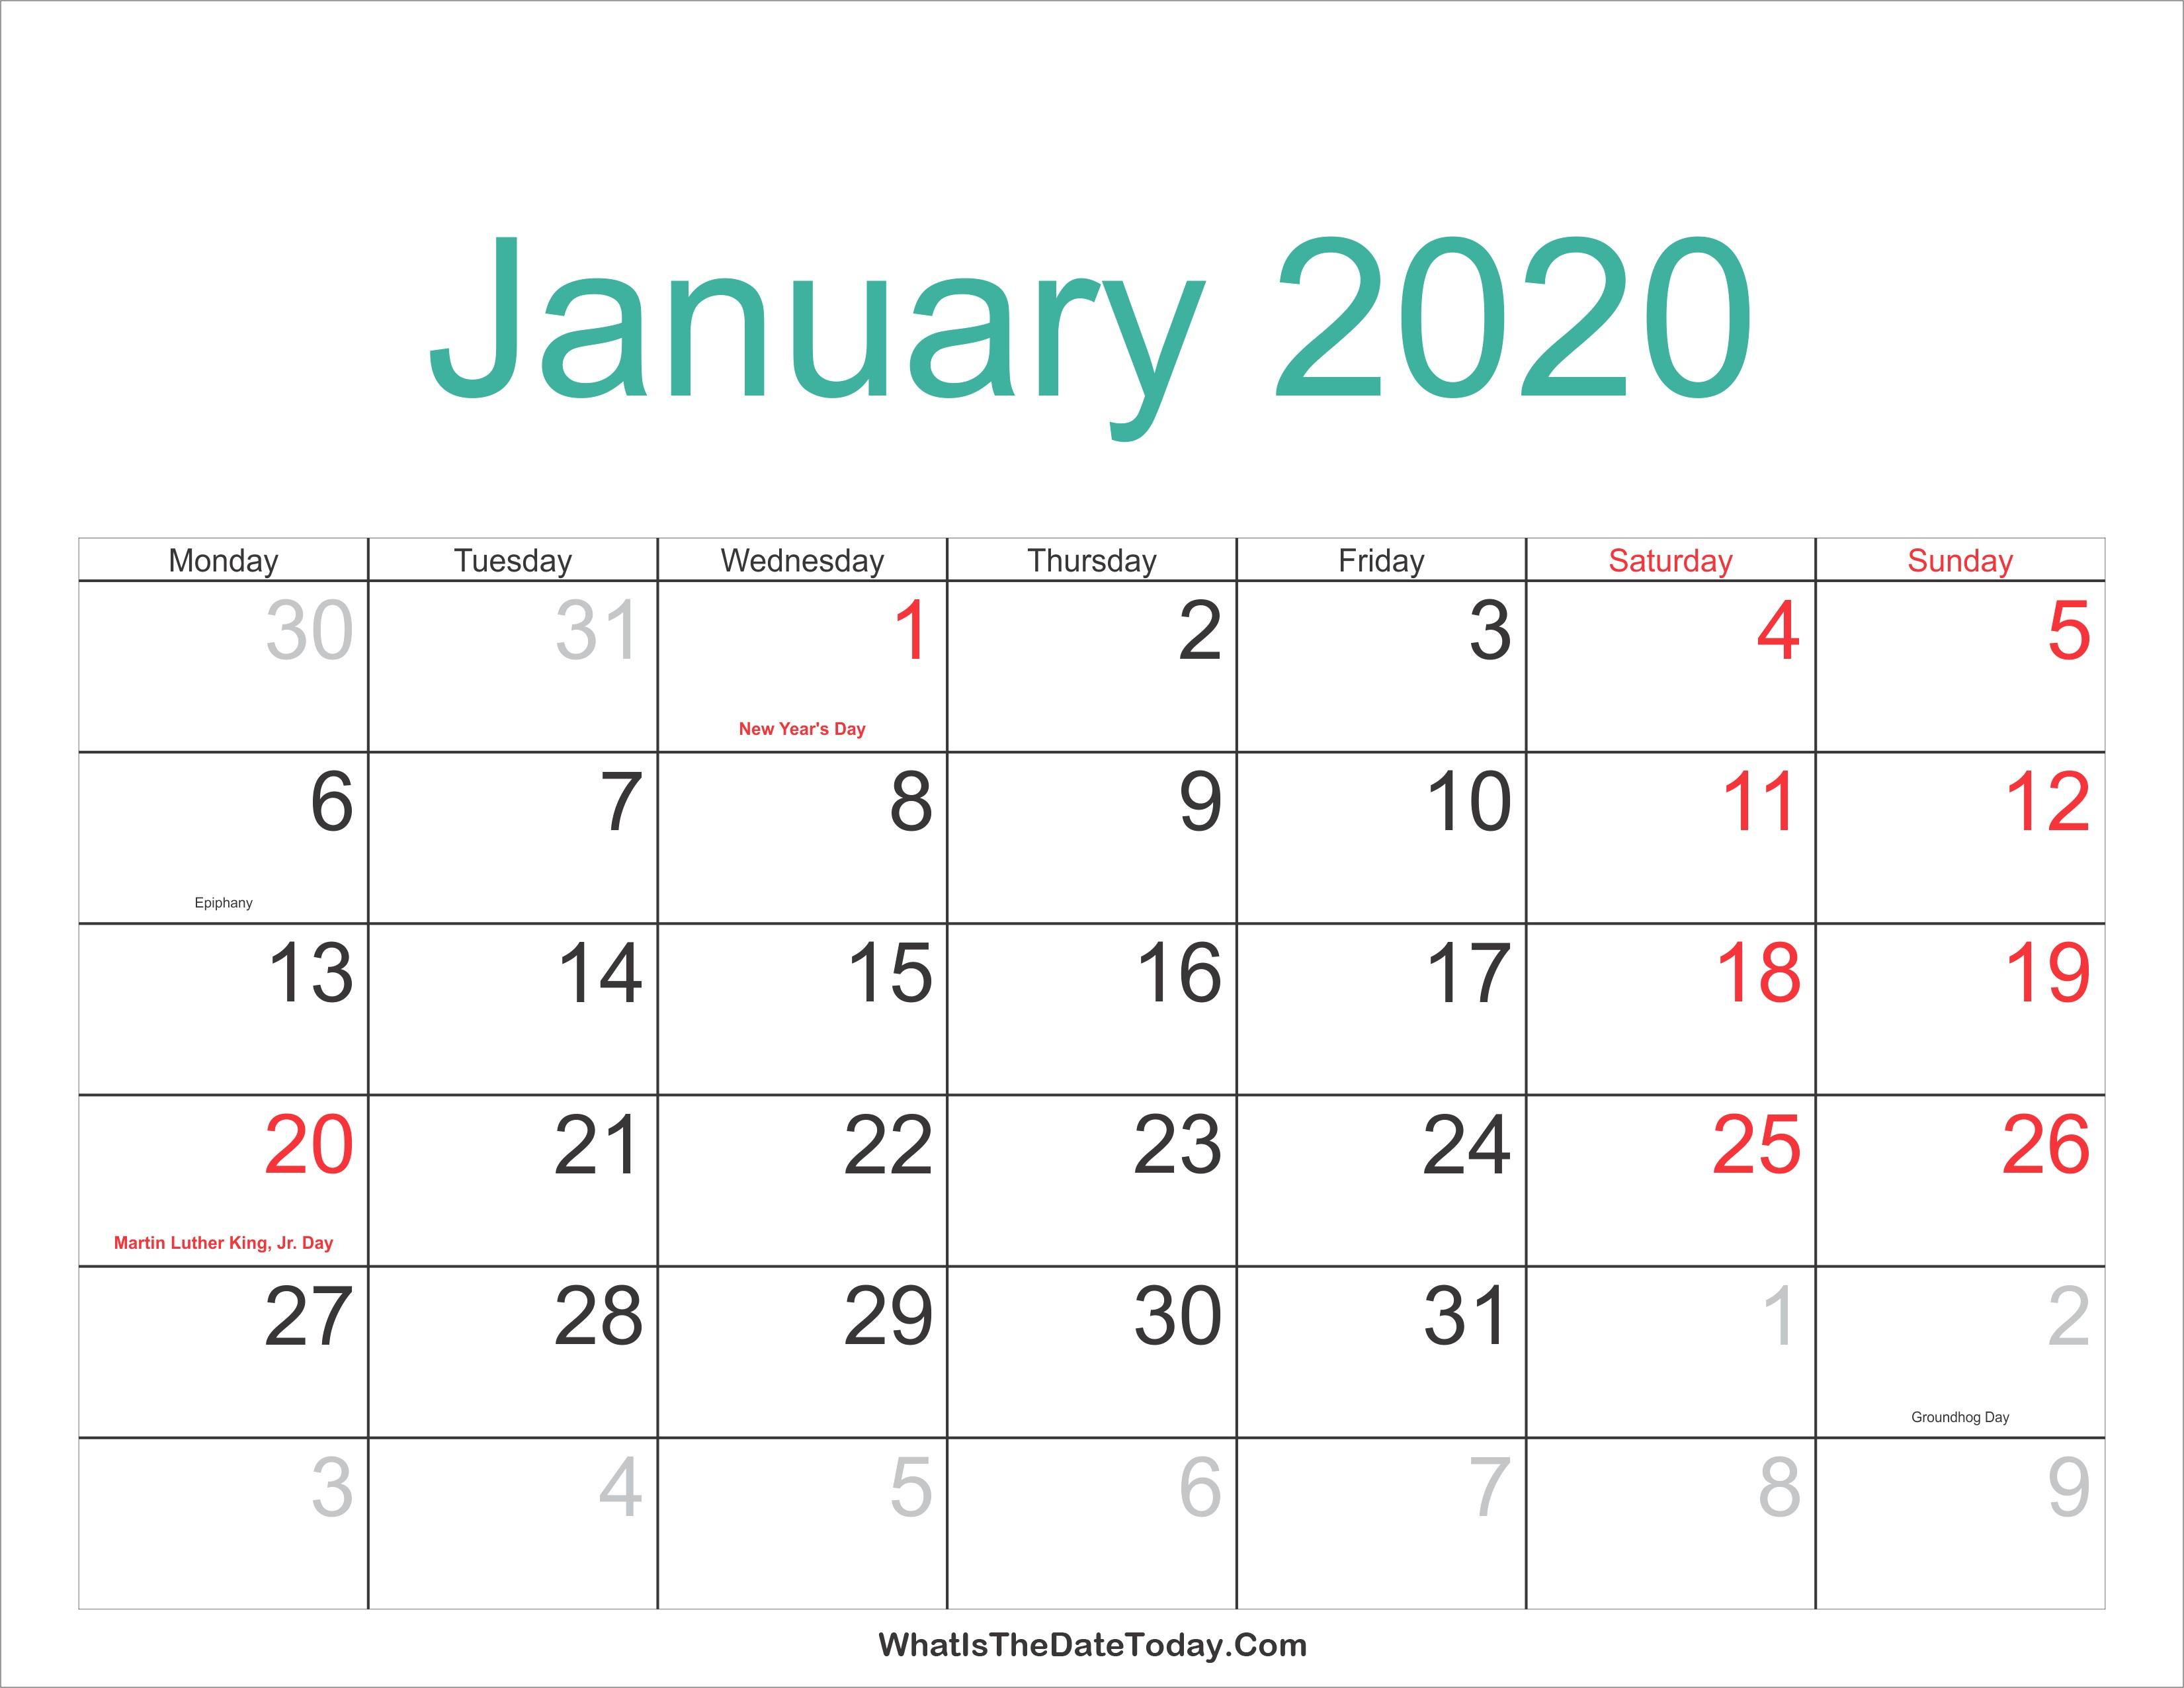 January 2020 Calendar Printable Holidays Full